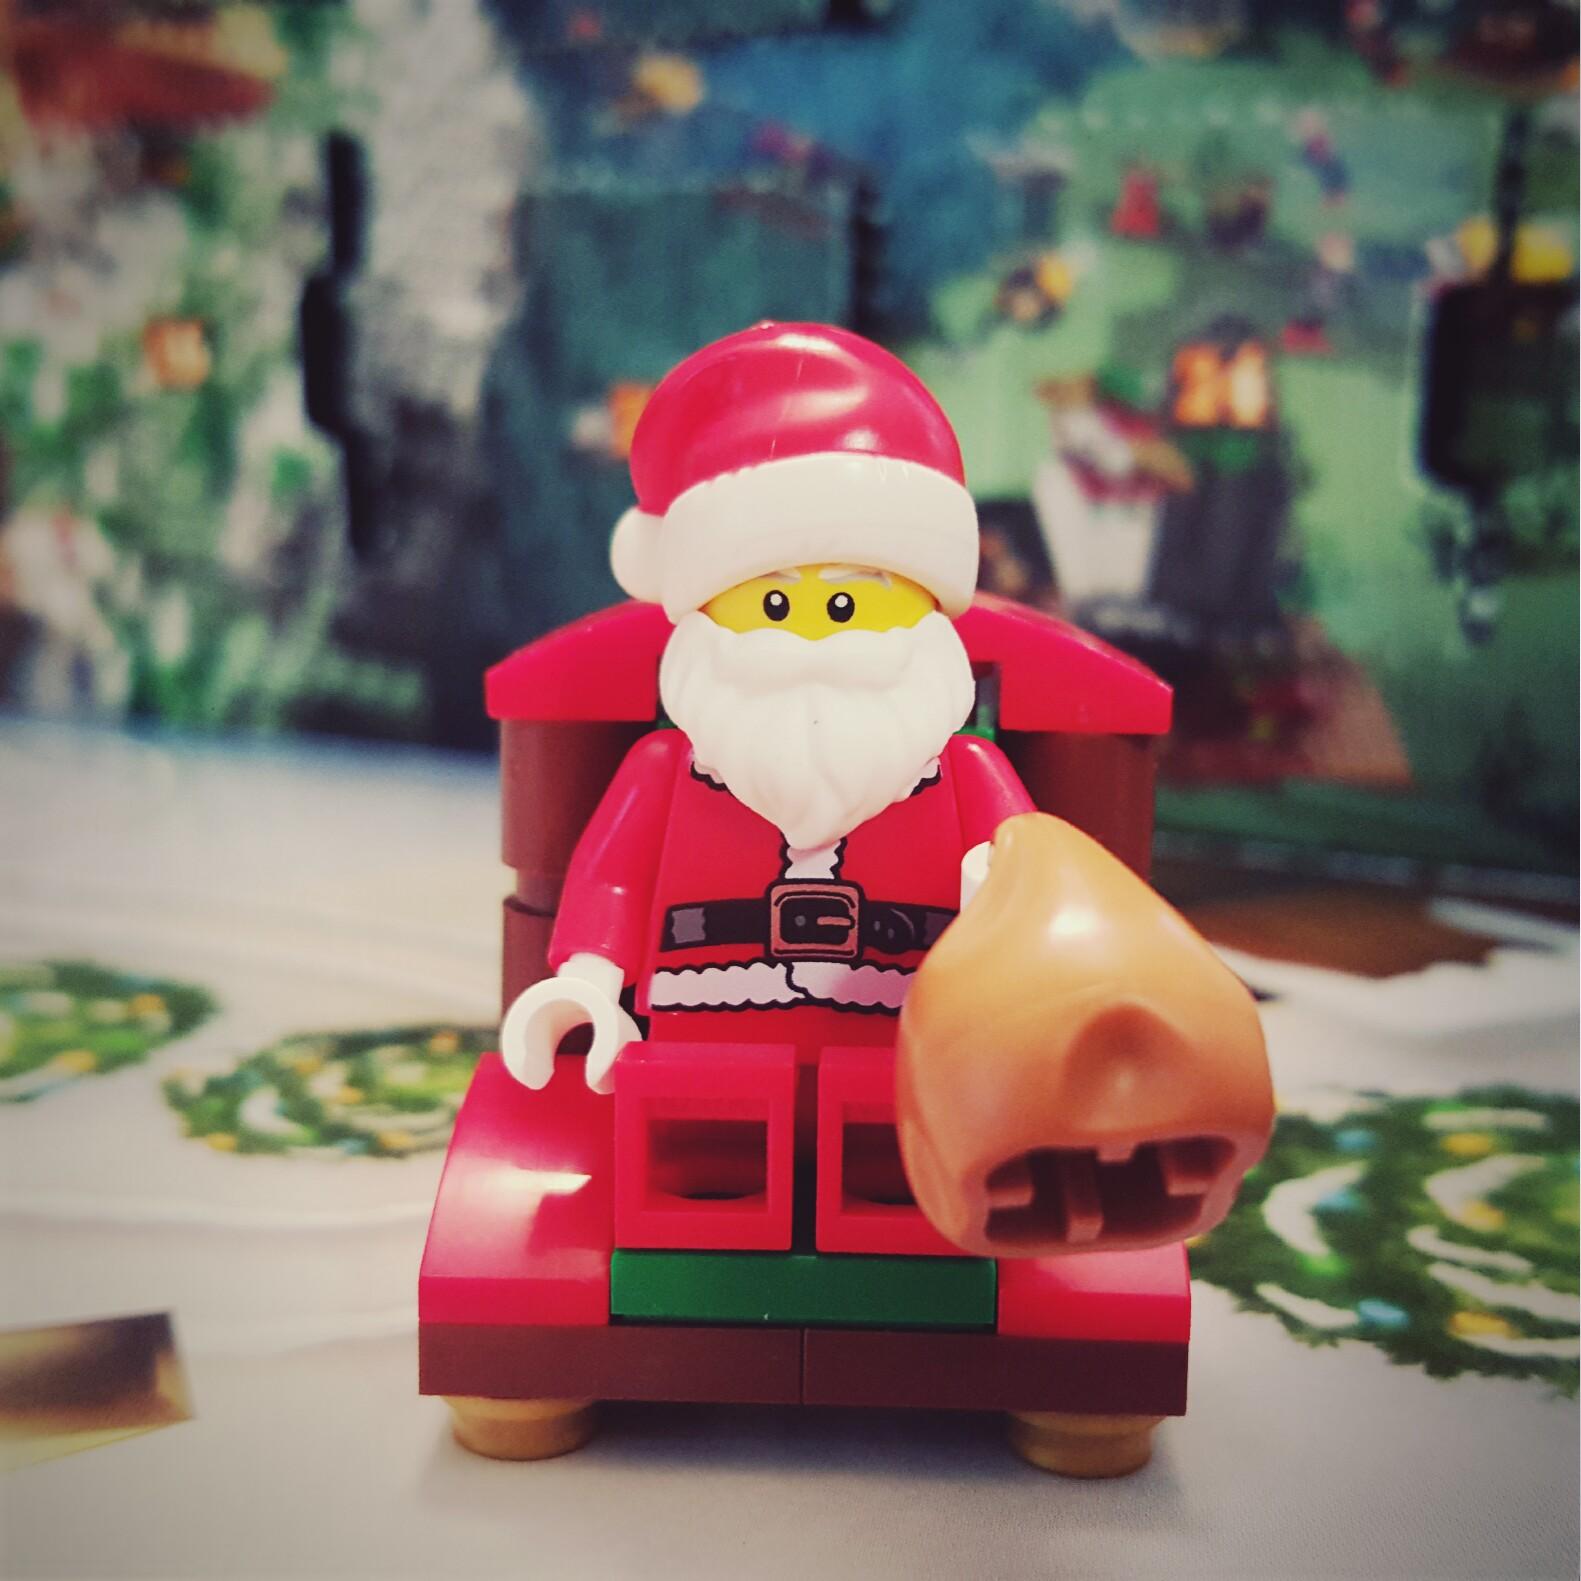 Day 24 Santa Clause Minifigure from LEGO City Advent Calendar